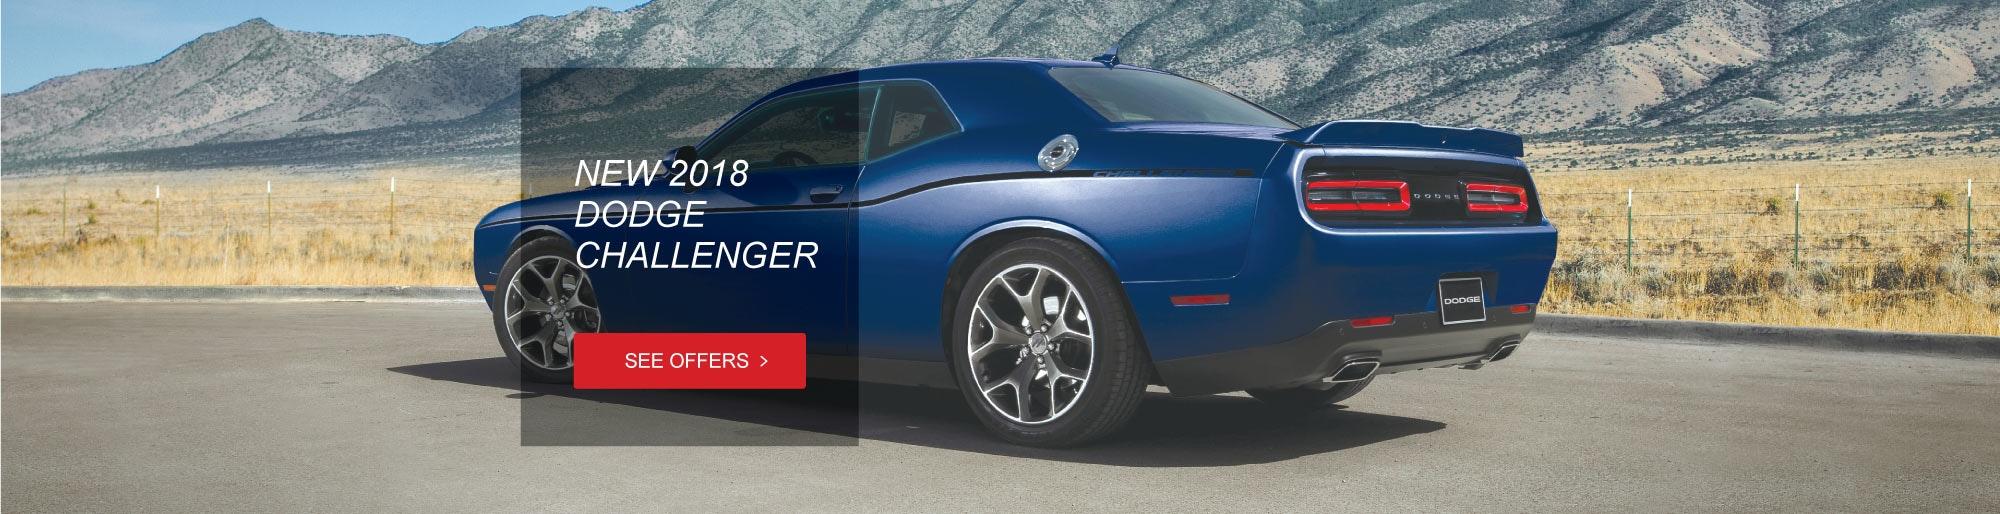 Lithia Dodge Missoula >> New & Used Car Dealership in Missoula   Lithia Chrysler ...